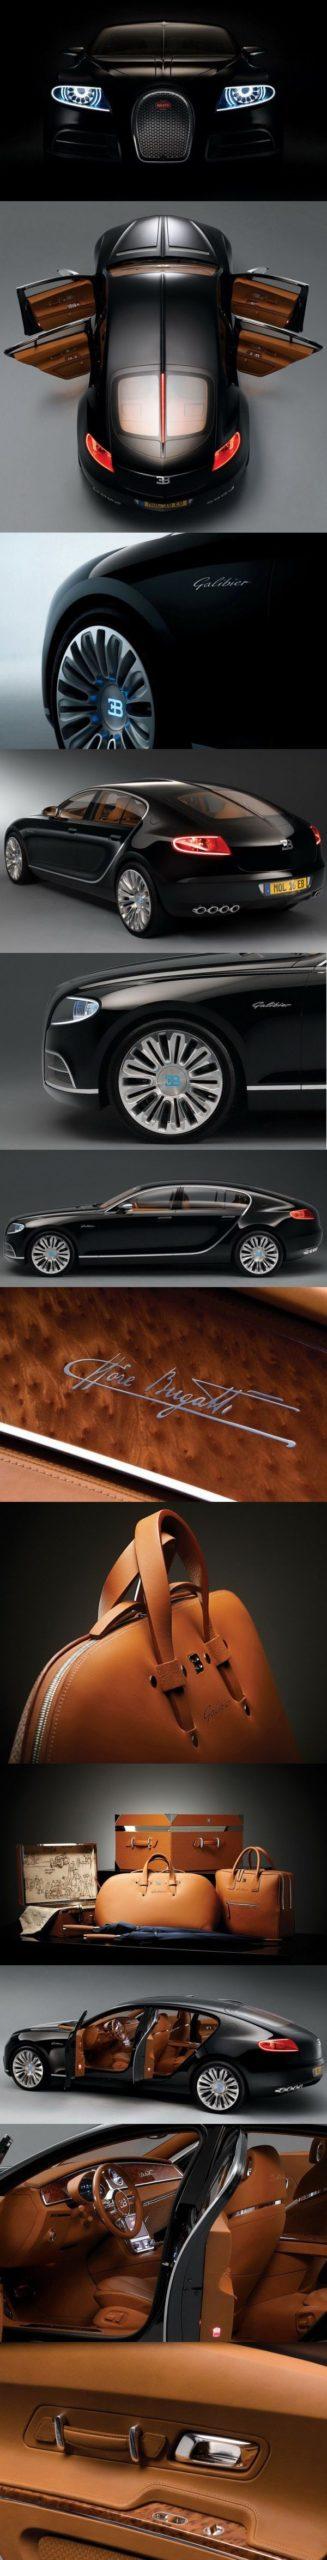 BUGATTI GALIBIER #LuxuryCars #VintageCars #SportCars #ConceptCars Dennis Mancino